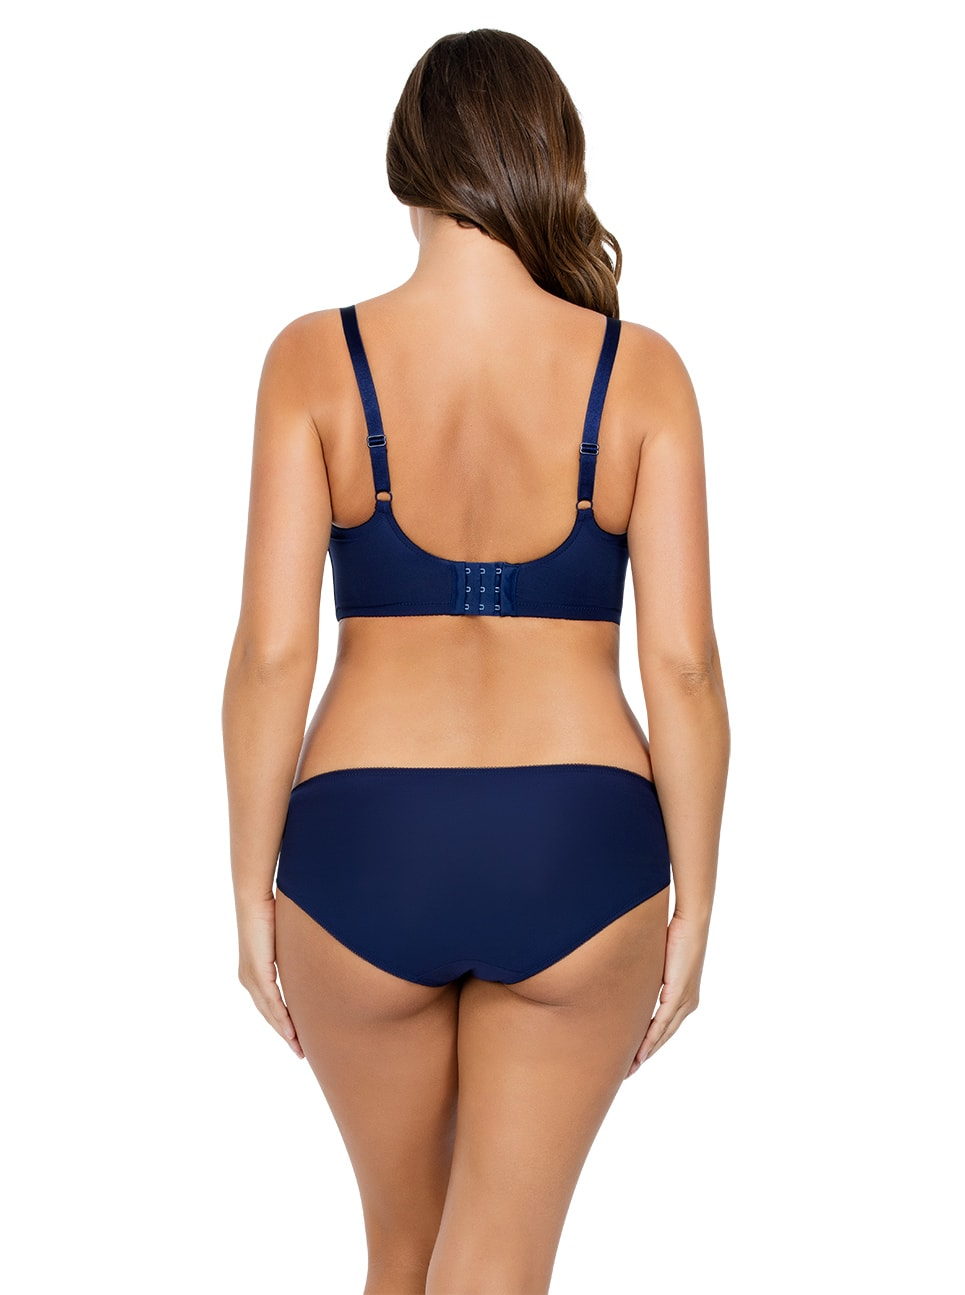 PARFAIT Cora UnlinedLonglineBraP5632 BikiniP5633 NavyBlue Back copy 2 - Cora Bikini - Navy Blue - P5633